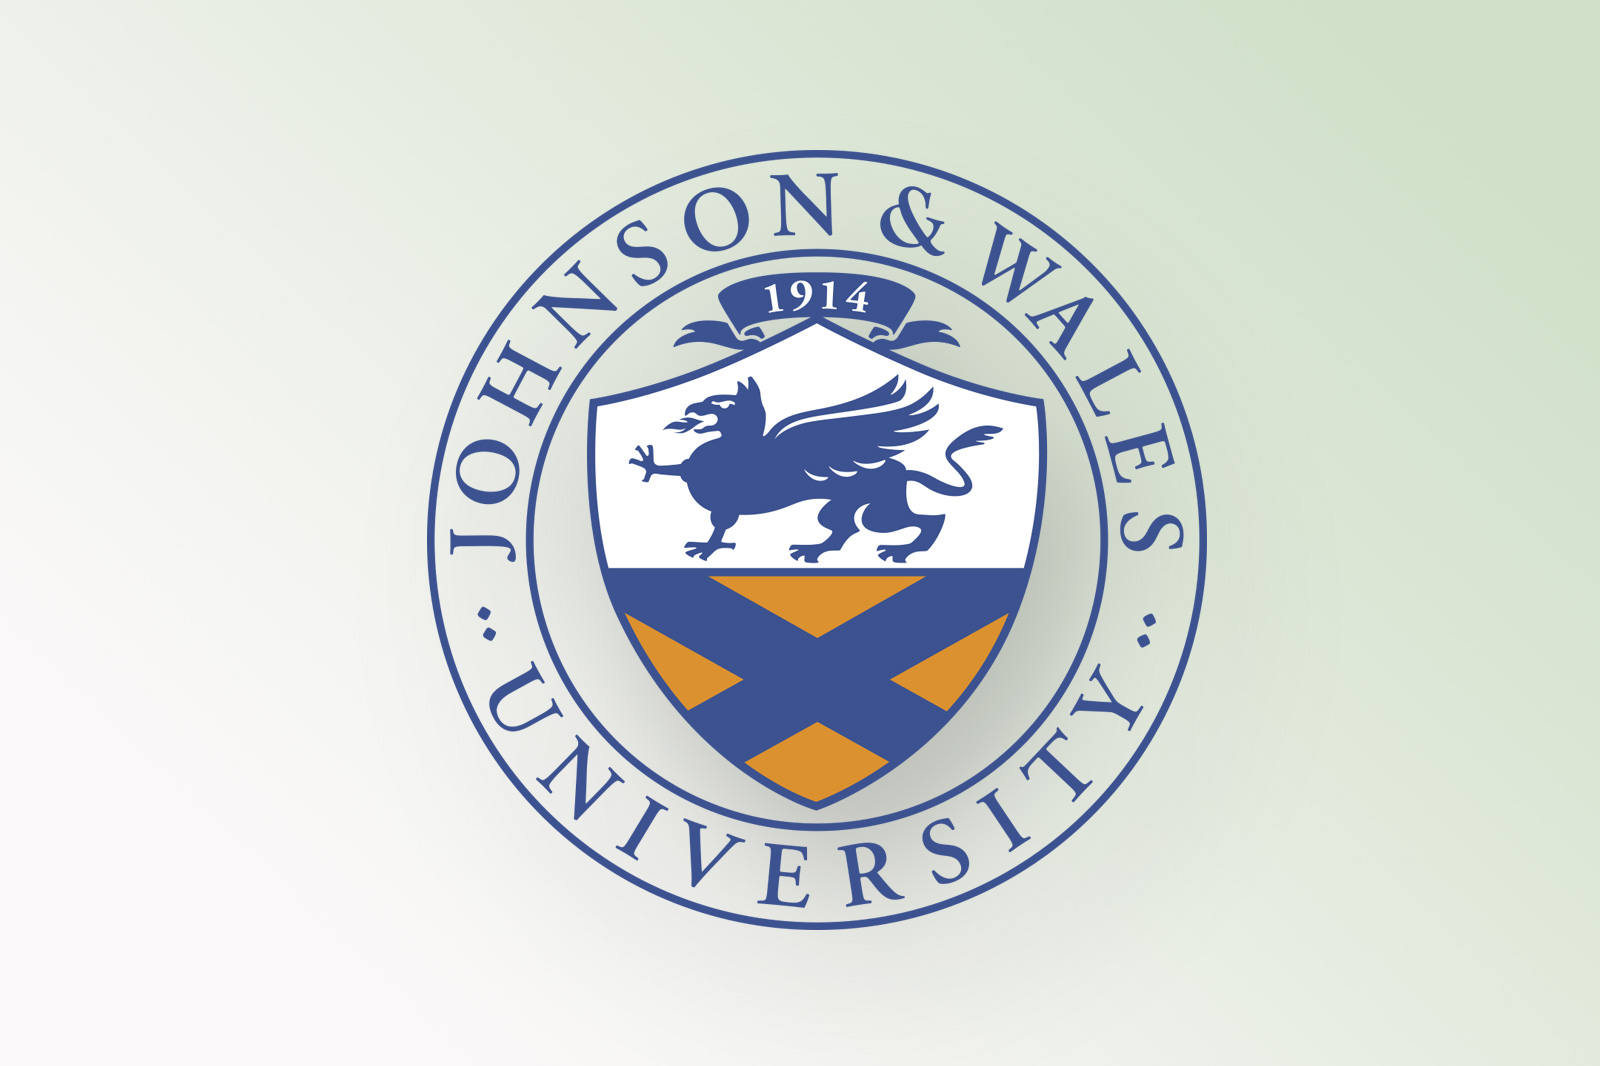 Johnson & Wales University Seal